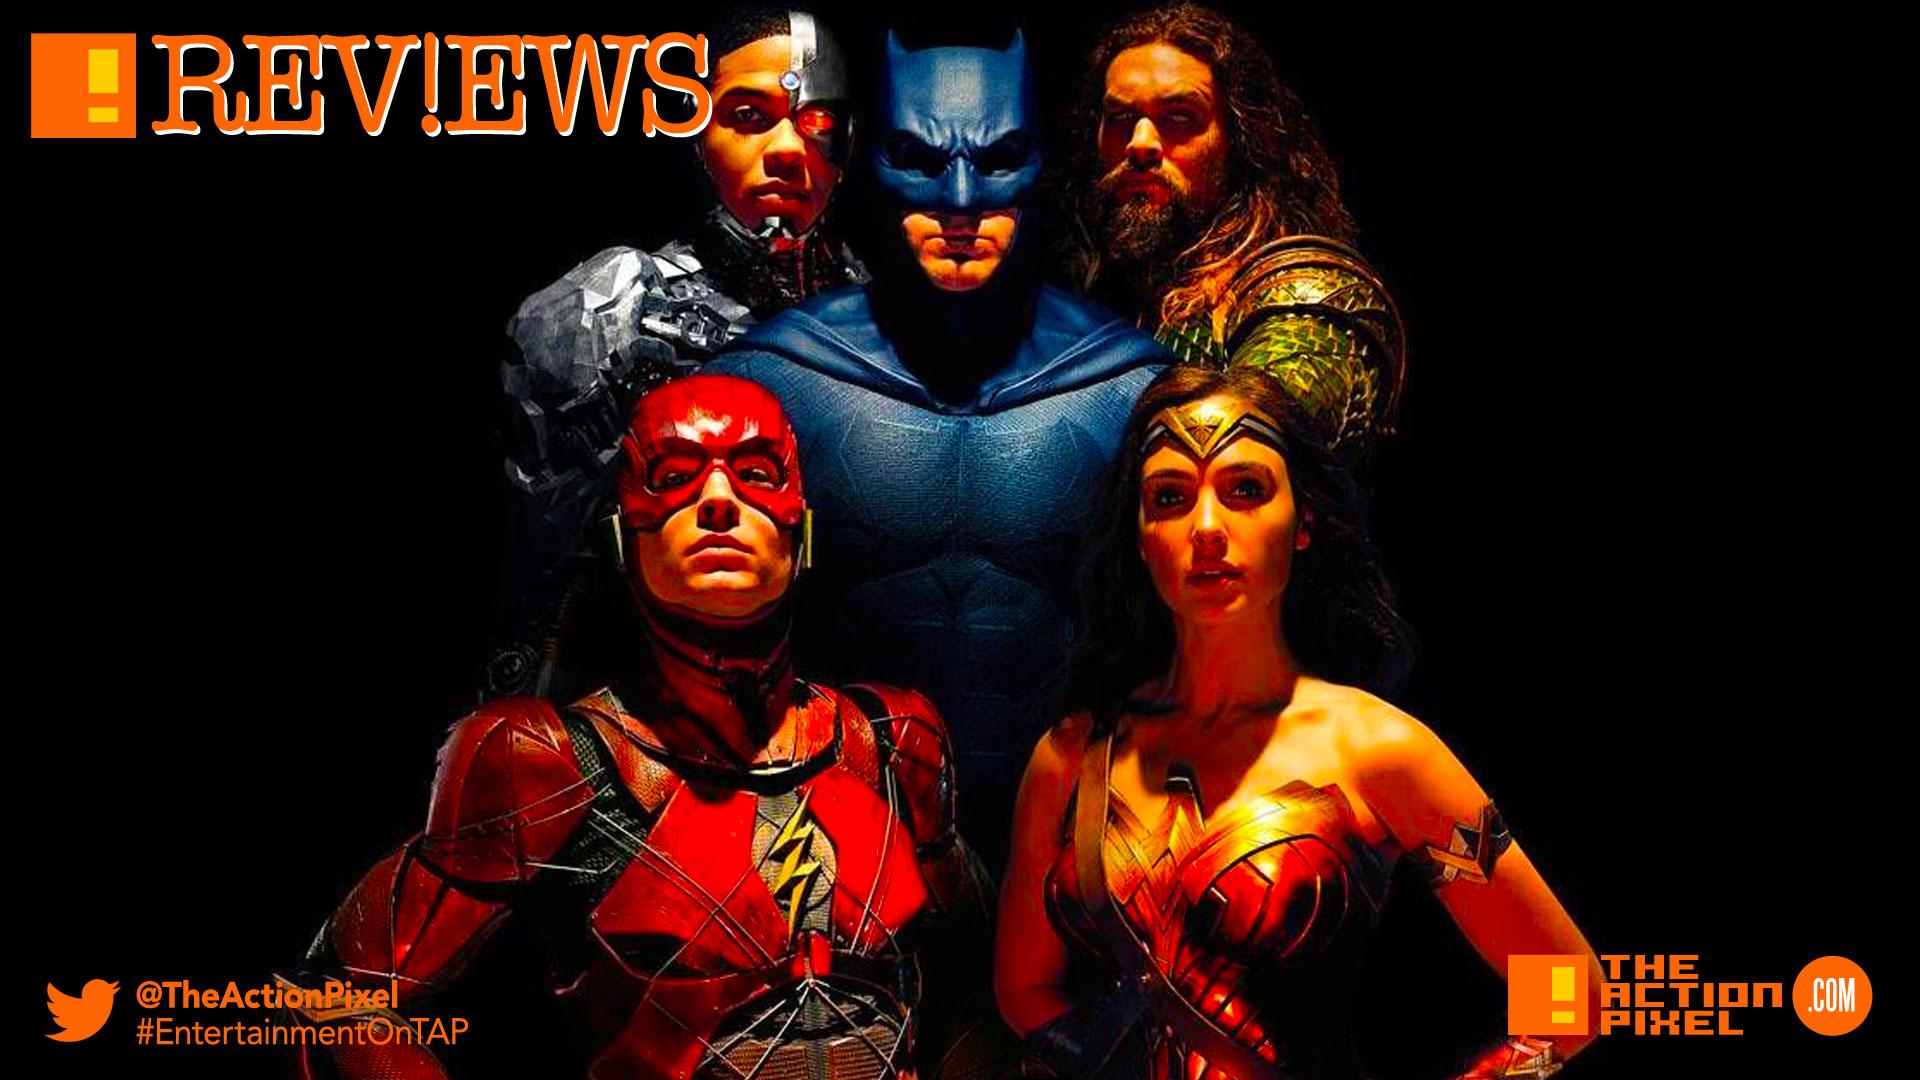 the dark knight, unite the league,JL, justice league, dc comics ,batman, superman, wonder woman, princess diana, diana prince, bruce wayne, ben affleck, batfleck, batffleck, gal gadot, cyborg, ray fisher, aquaman, jason momoa, arthur , flash,ezra miller, justice league movie, zack snyder, poster, wb pictures, warner bros. pictures, warner bros, the action pixel, entertainment on tap,teaser, poster, all in, november 17,teaser, trailer, heroes trailer,, amazon, review, film review, movie review, entertainment on tap,